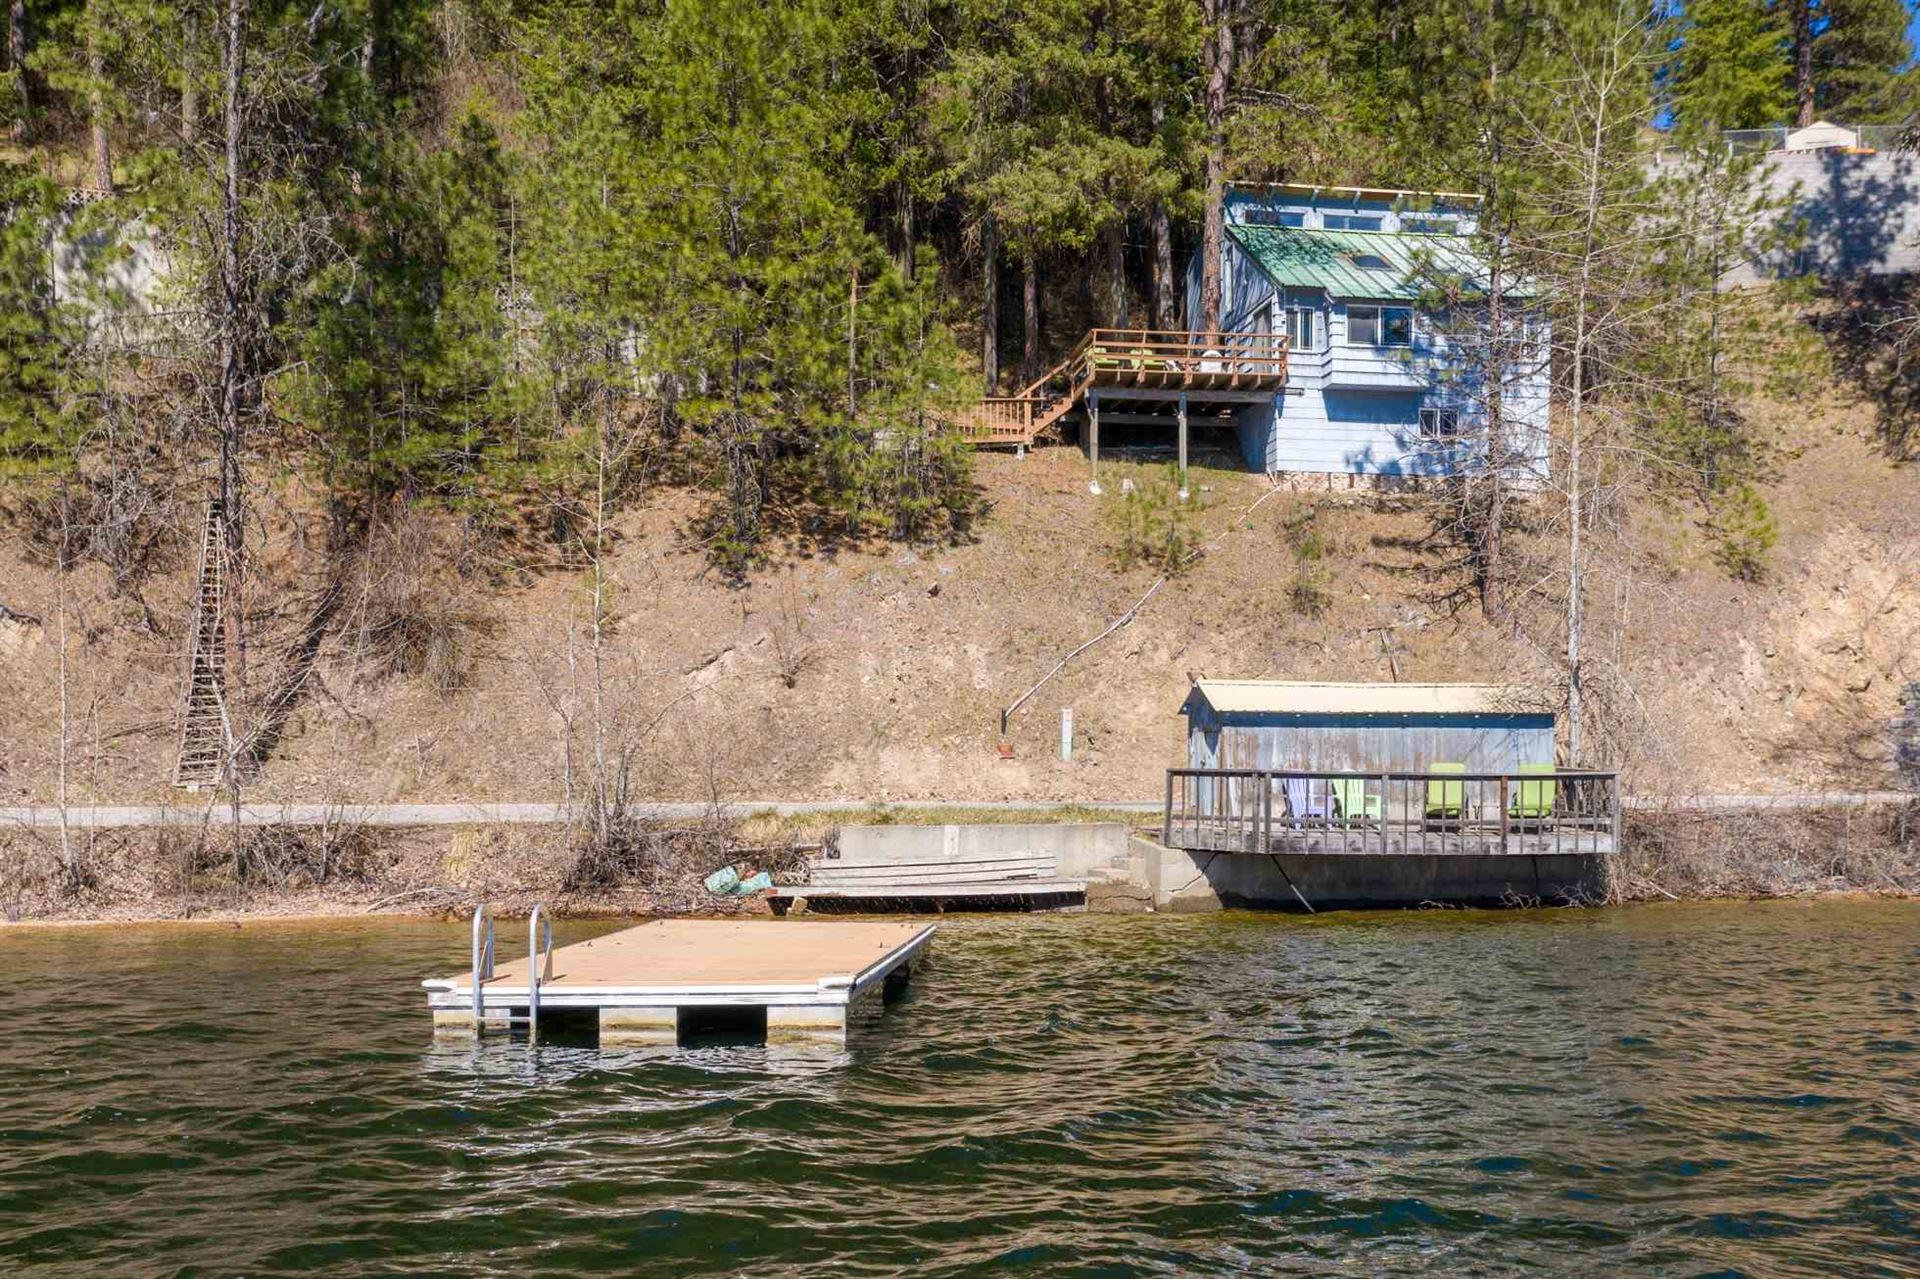 3959 N Deer Lake Rd, Loon Lake, WA 99148 - #: 202114285